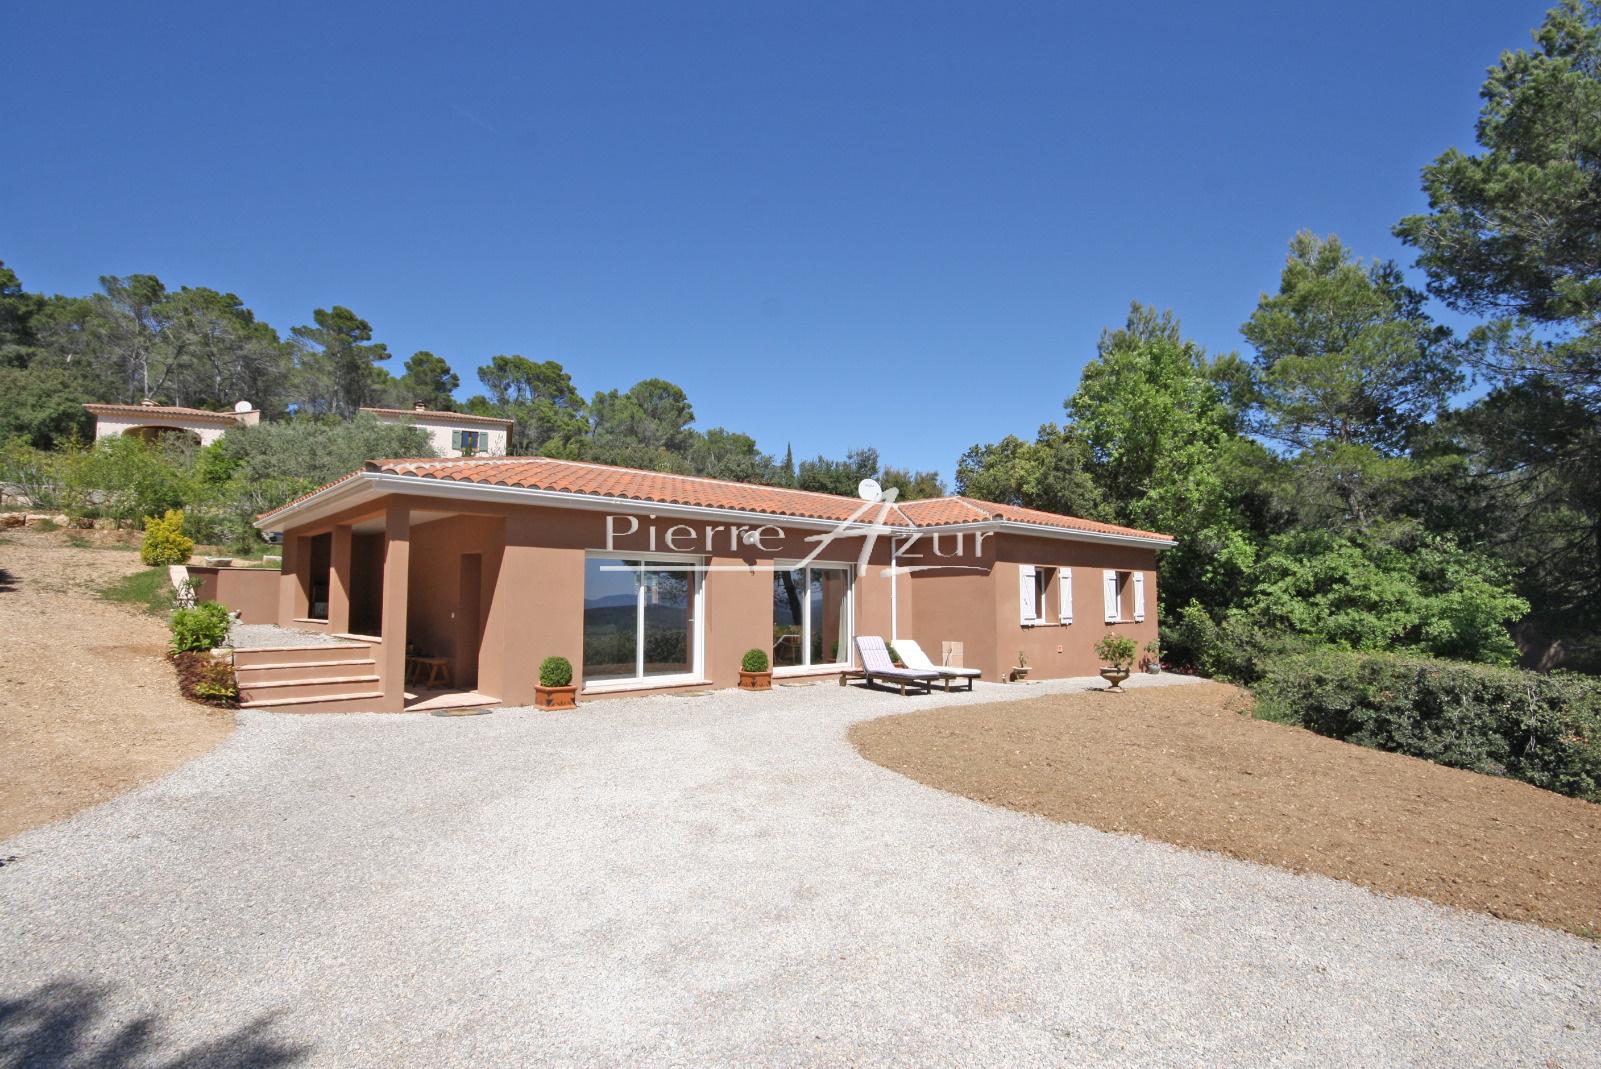 Vente villa neuve de plain pied for Villa neuve